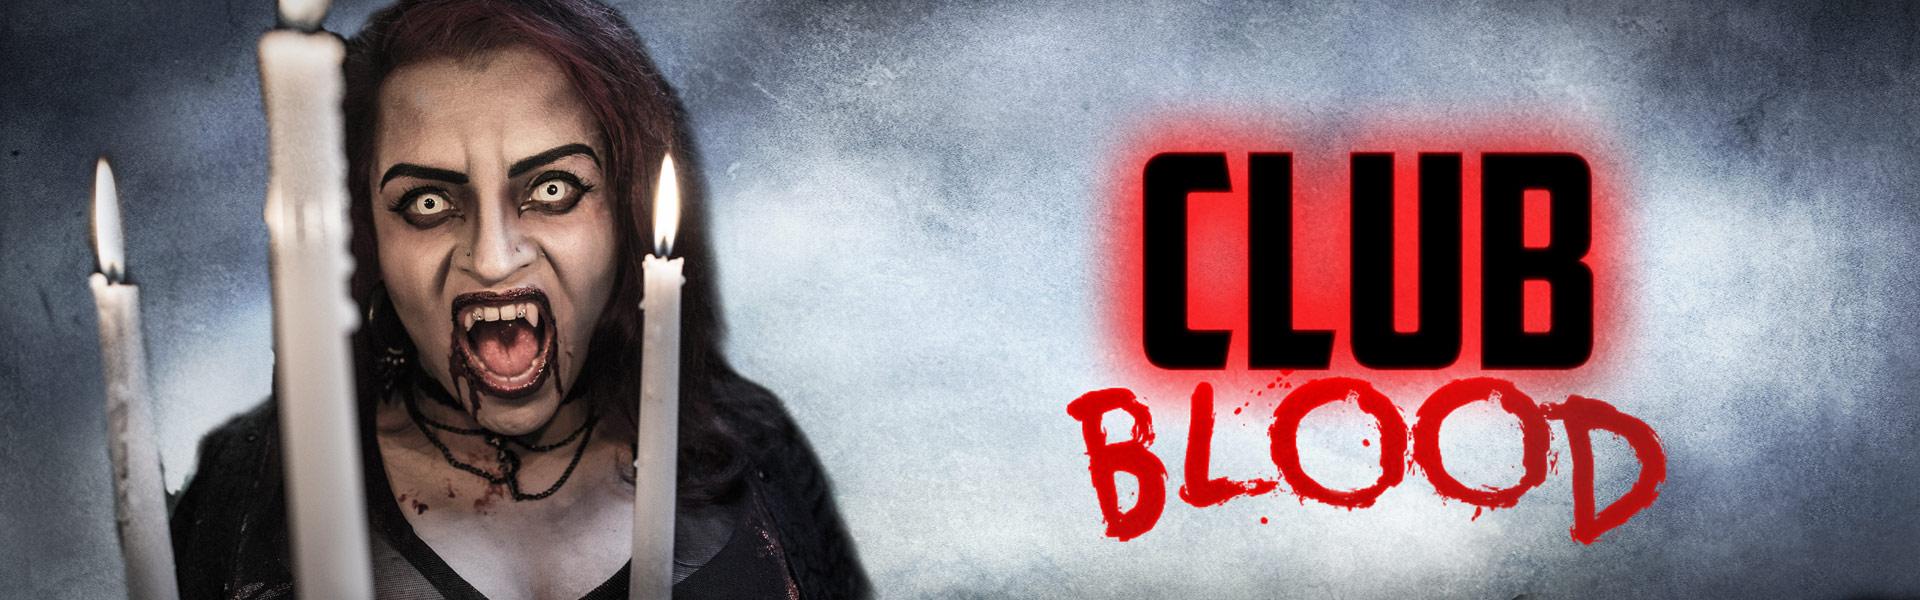 cw_clubblood_header